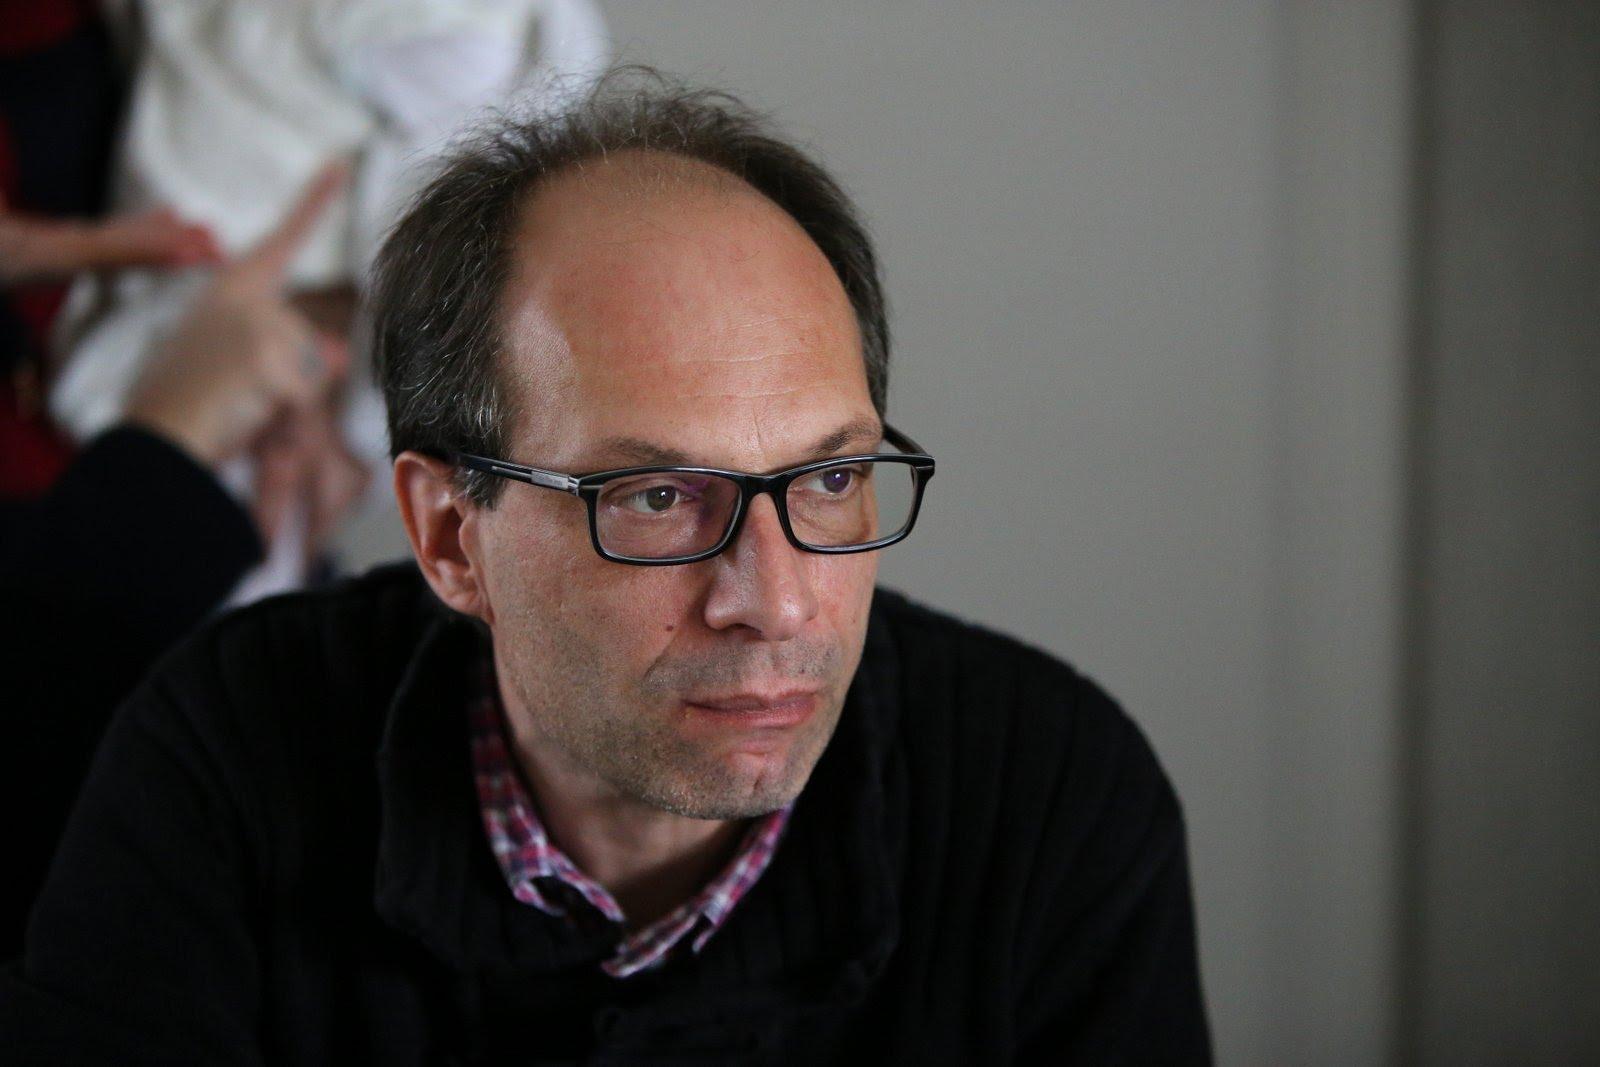 Konyks首席执行官奥利维亚(Olivier Medam)